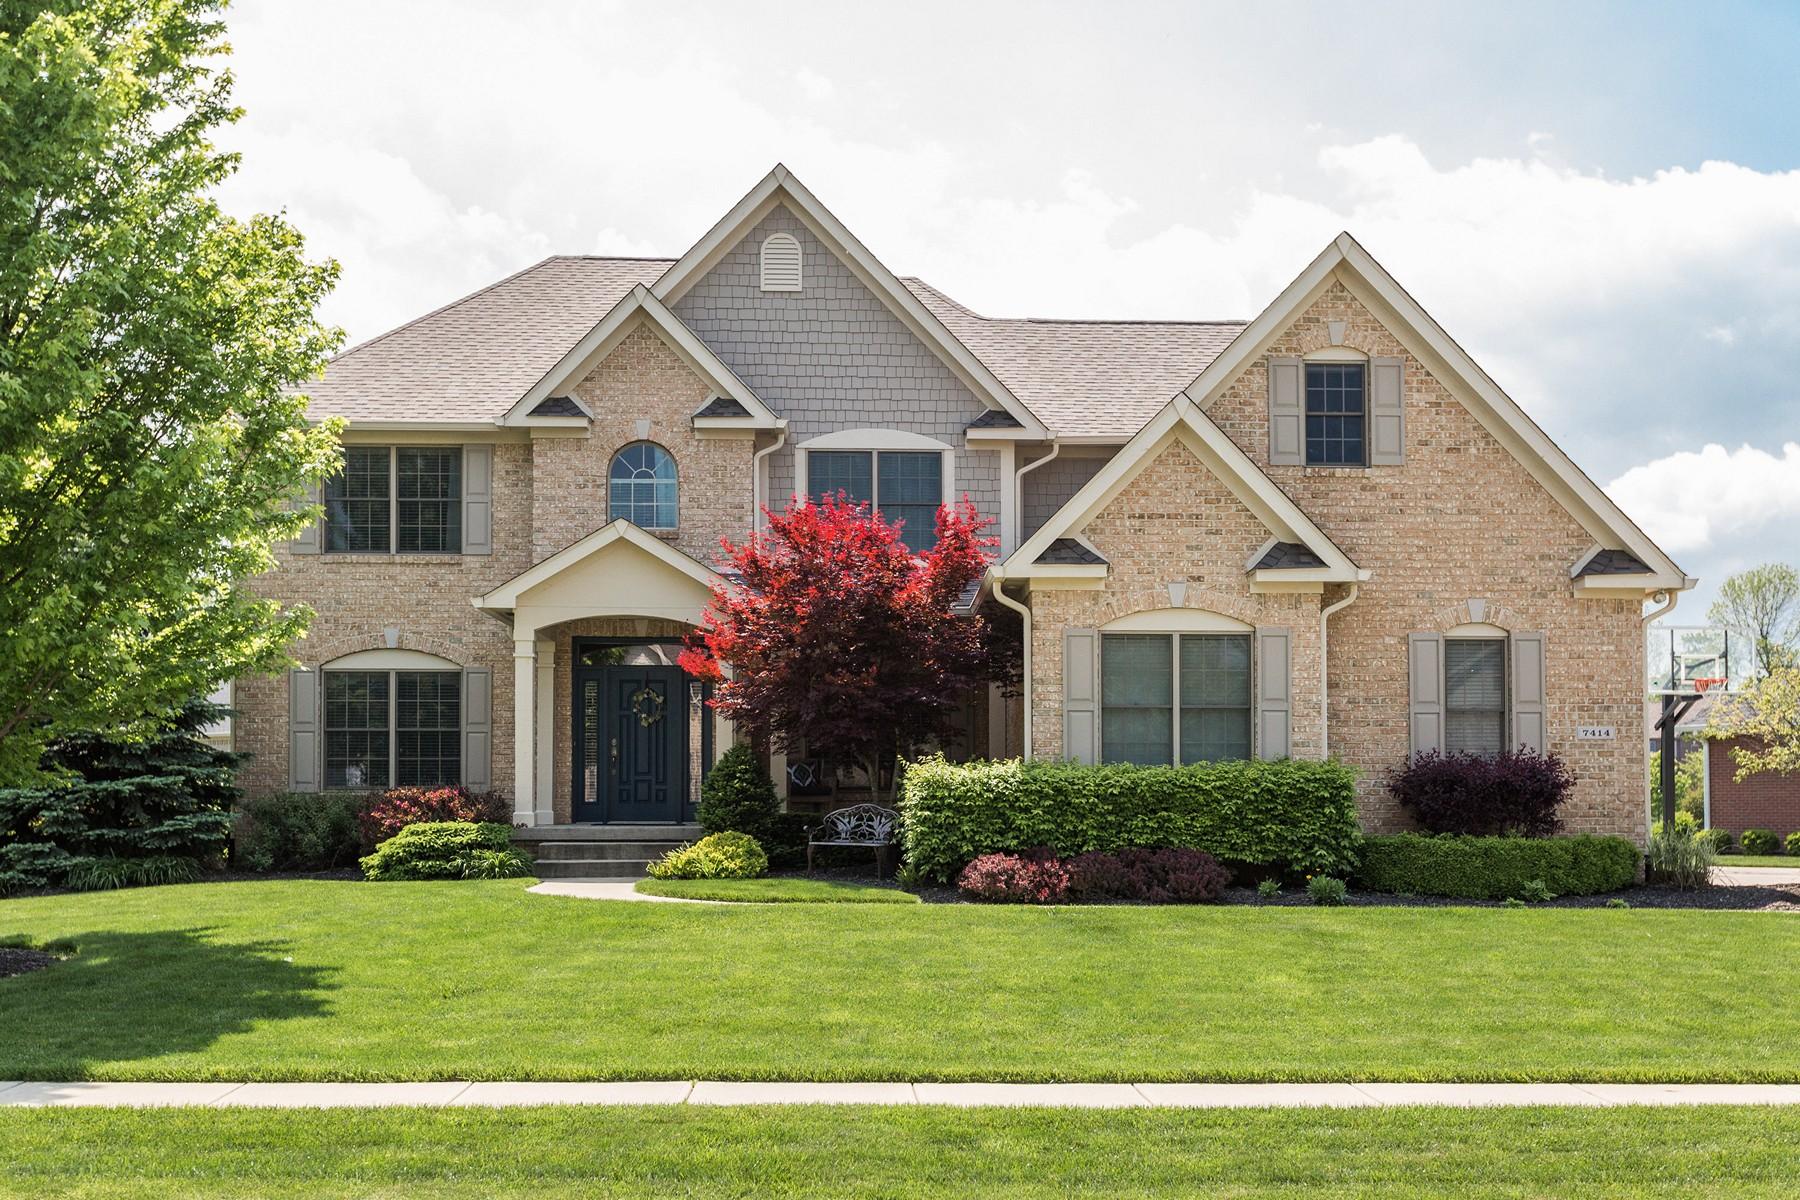 Casa Unifamiliar por un Venta en Gorgeous Home Ready For You 7414 Stones River Drive Indianapolis, Indiana, 46259 Estados Unidos